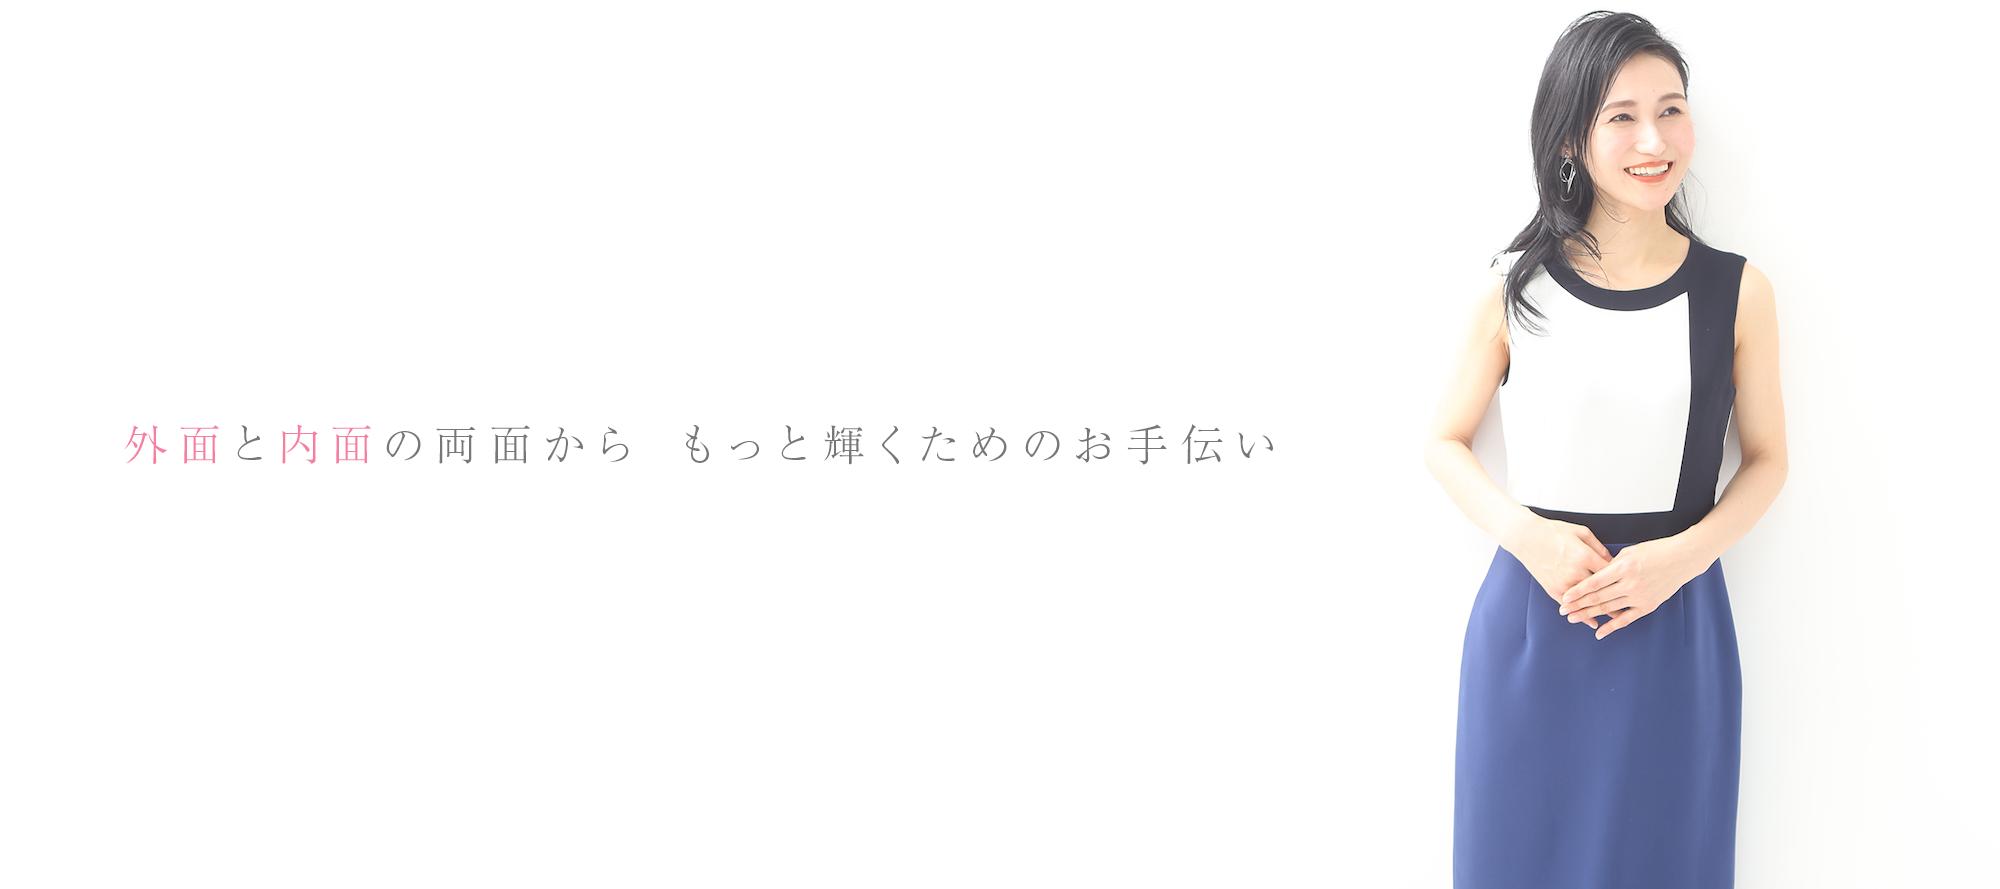 header-image-4